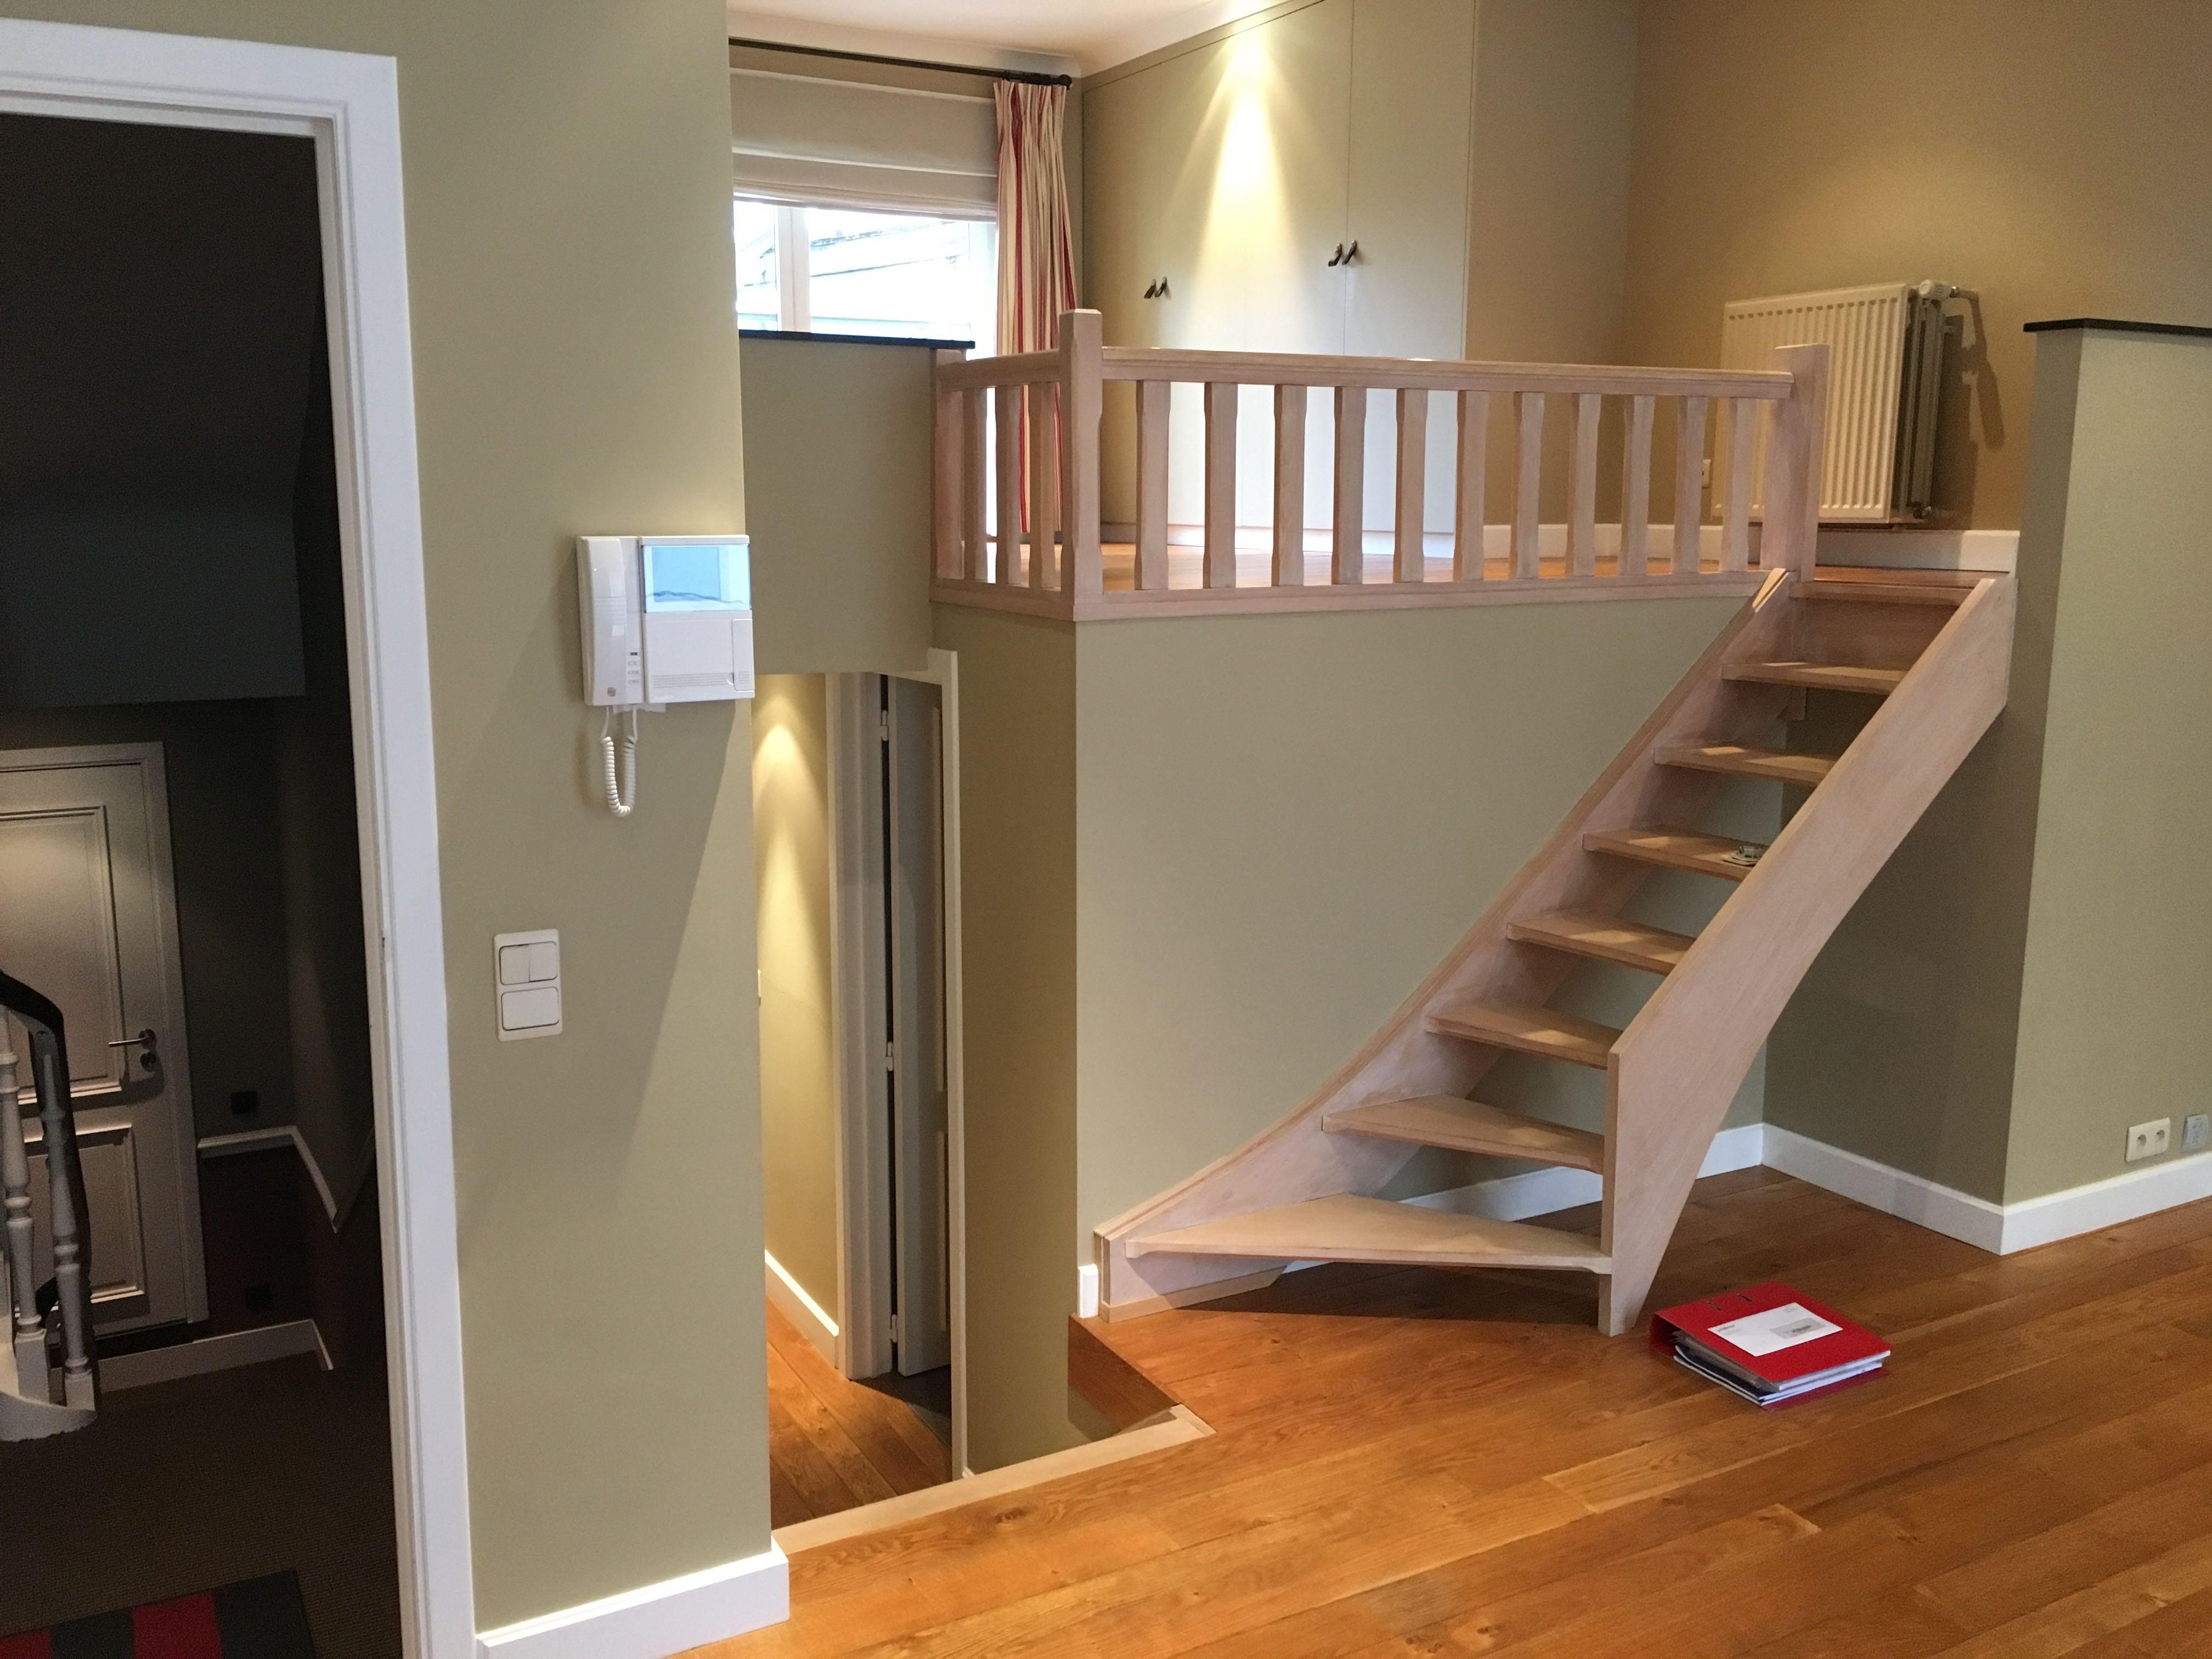 appartement louer bruxelles. Black Bedroom Furniture Sets. Home Design Ideas